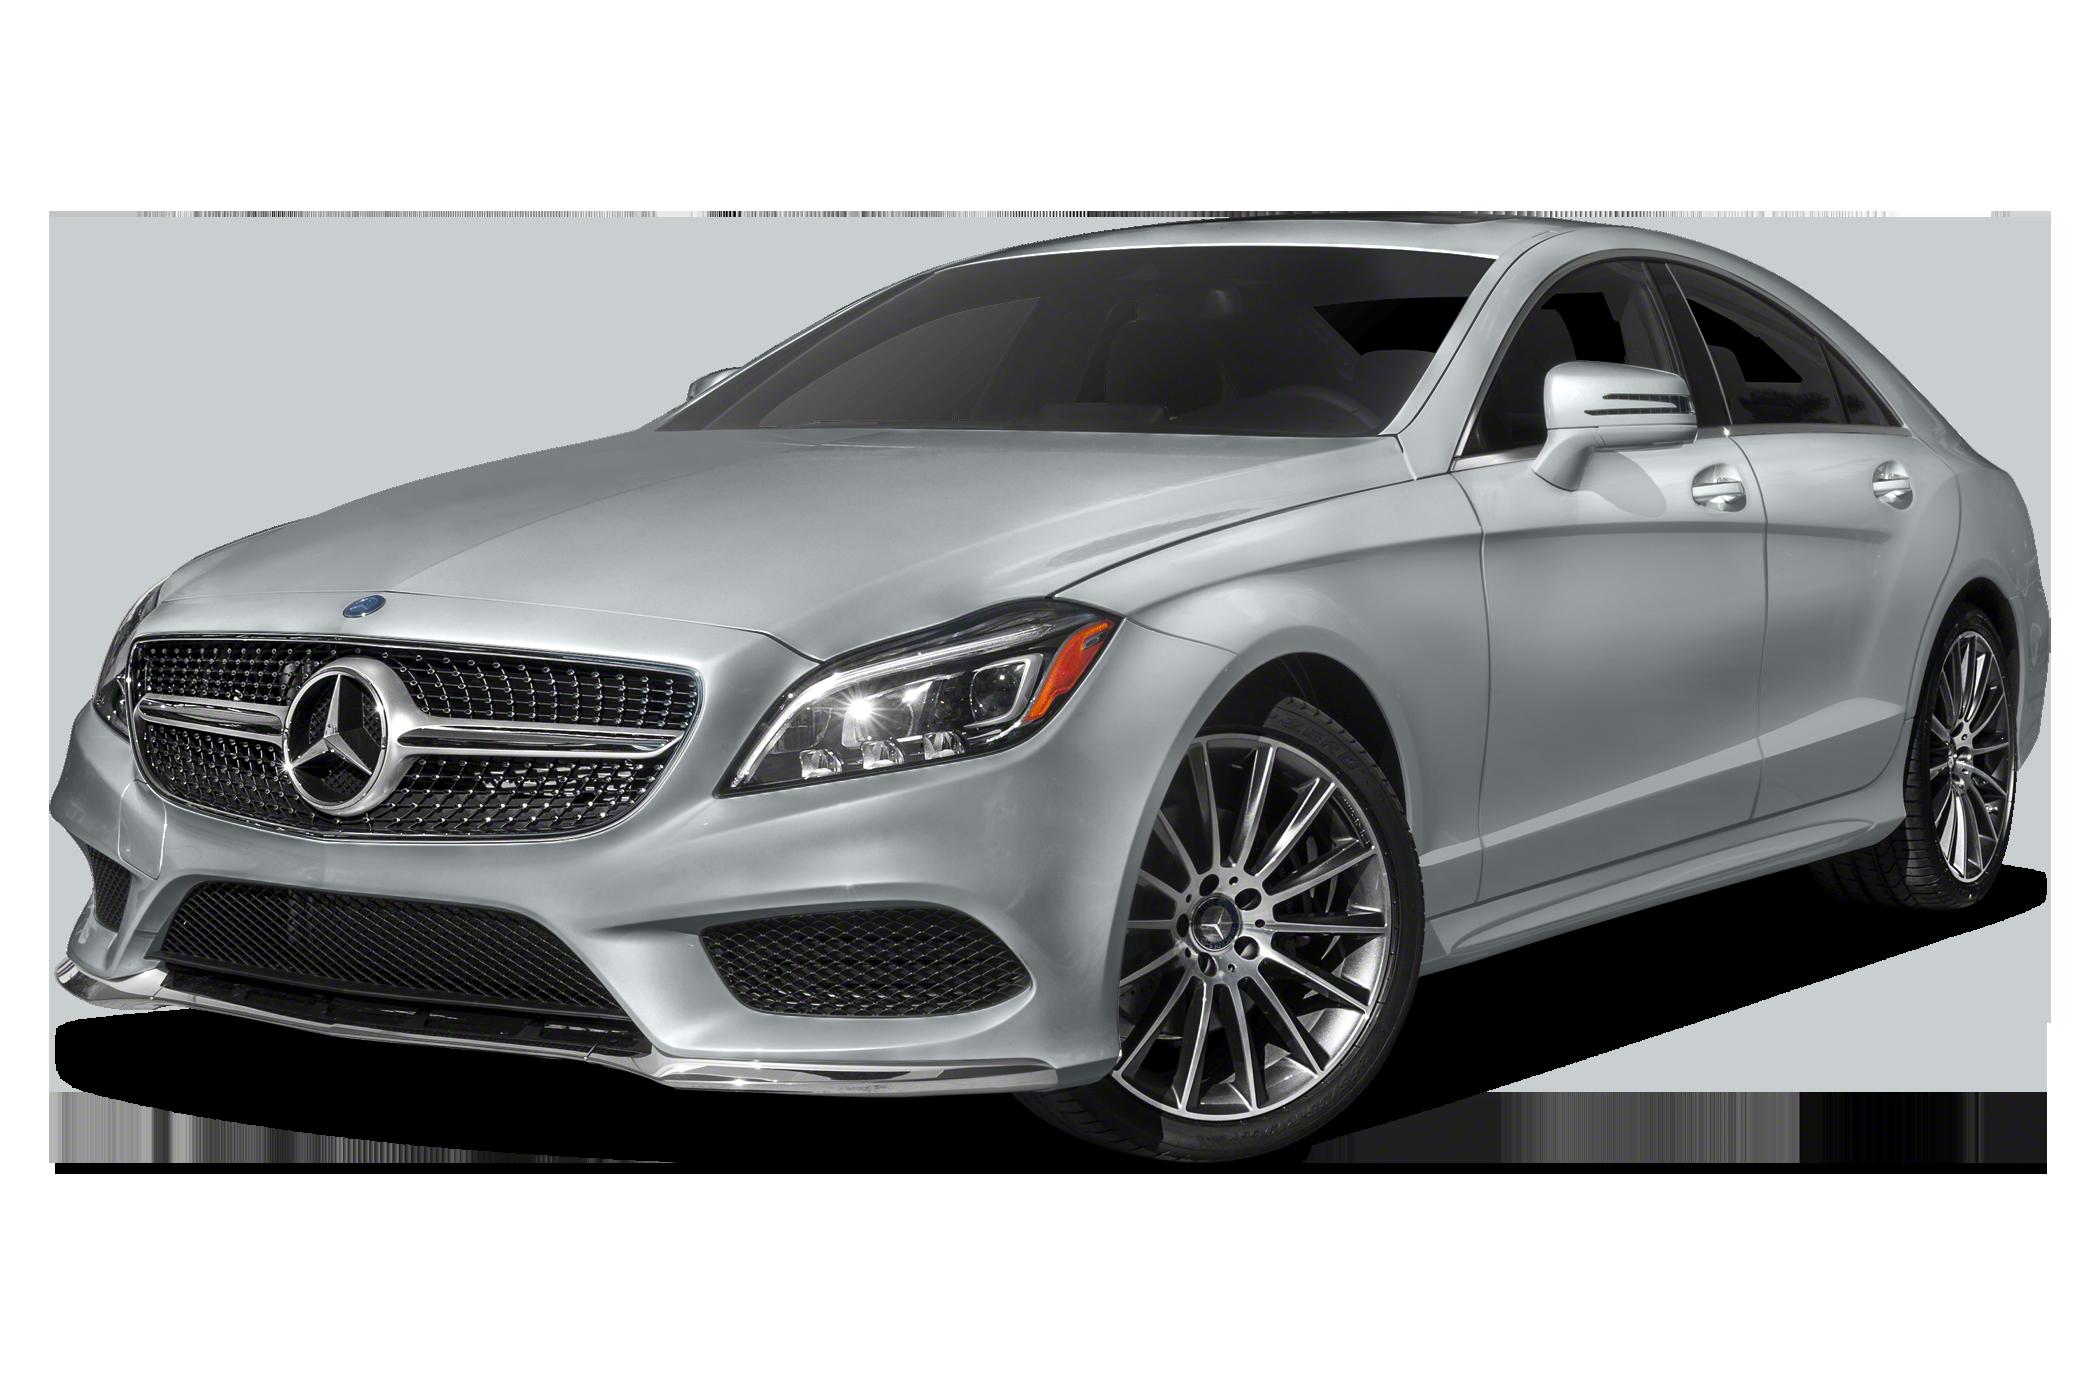 pare Mercedes benz Cls400